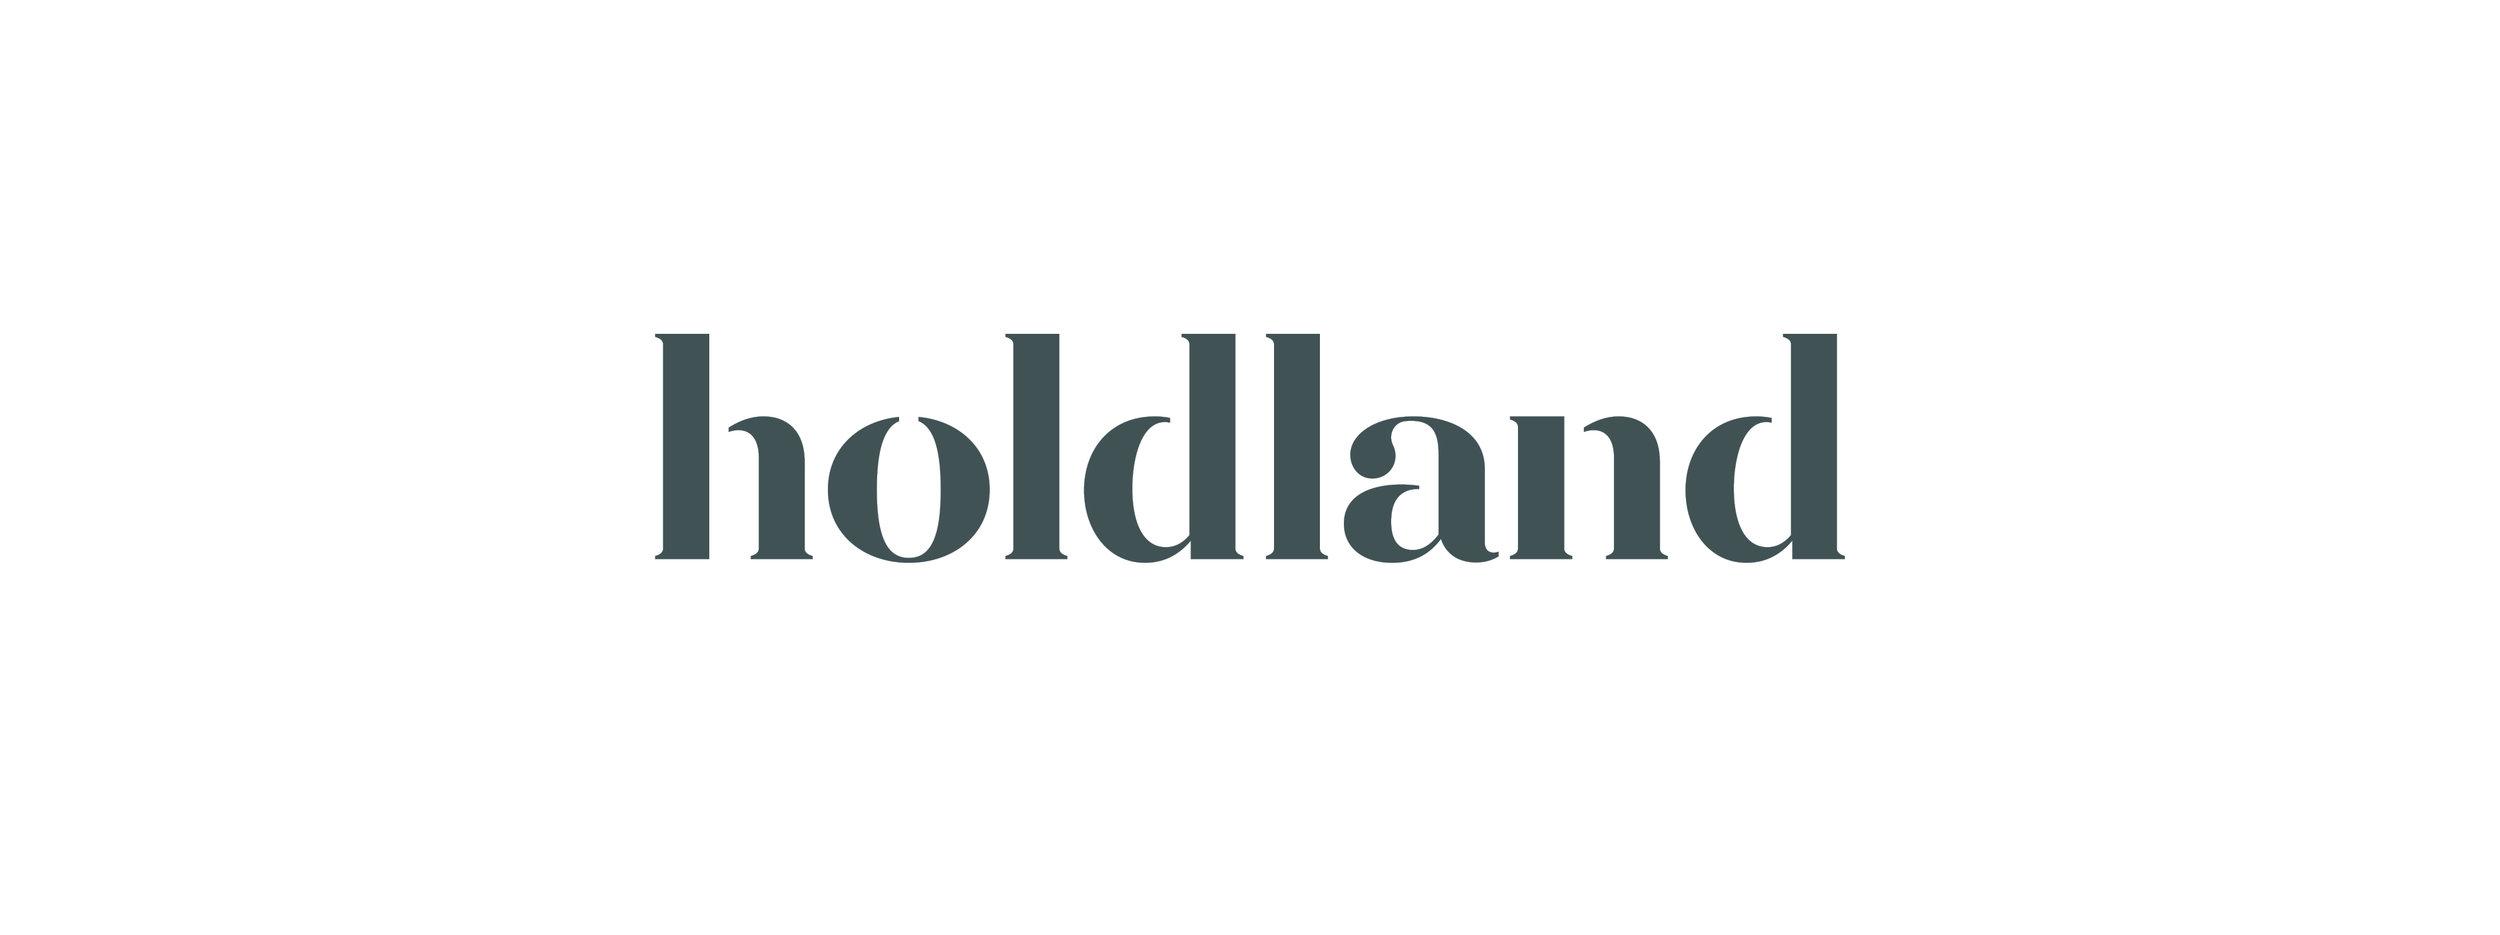 Enlisted_Web_Holdland_Brand_Logotype_V1.jpg